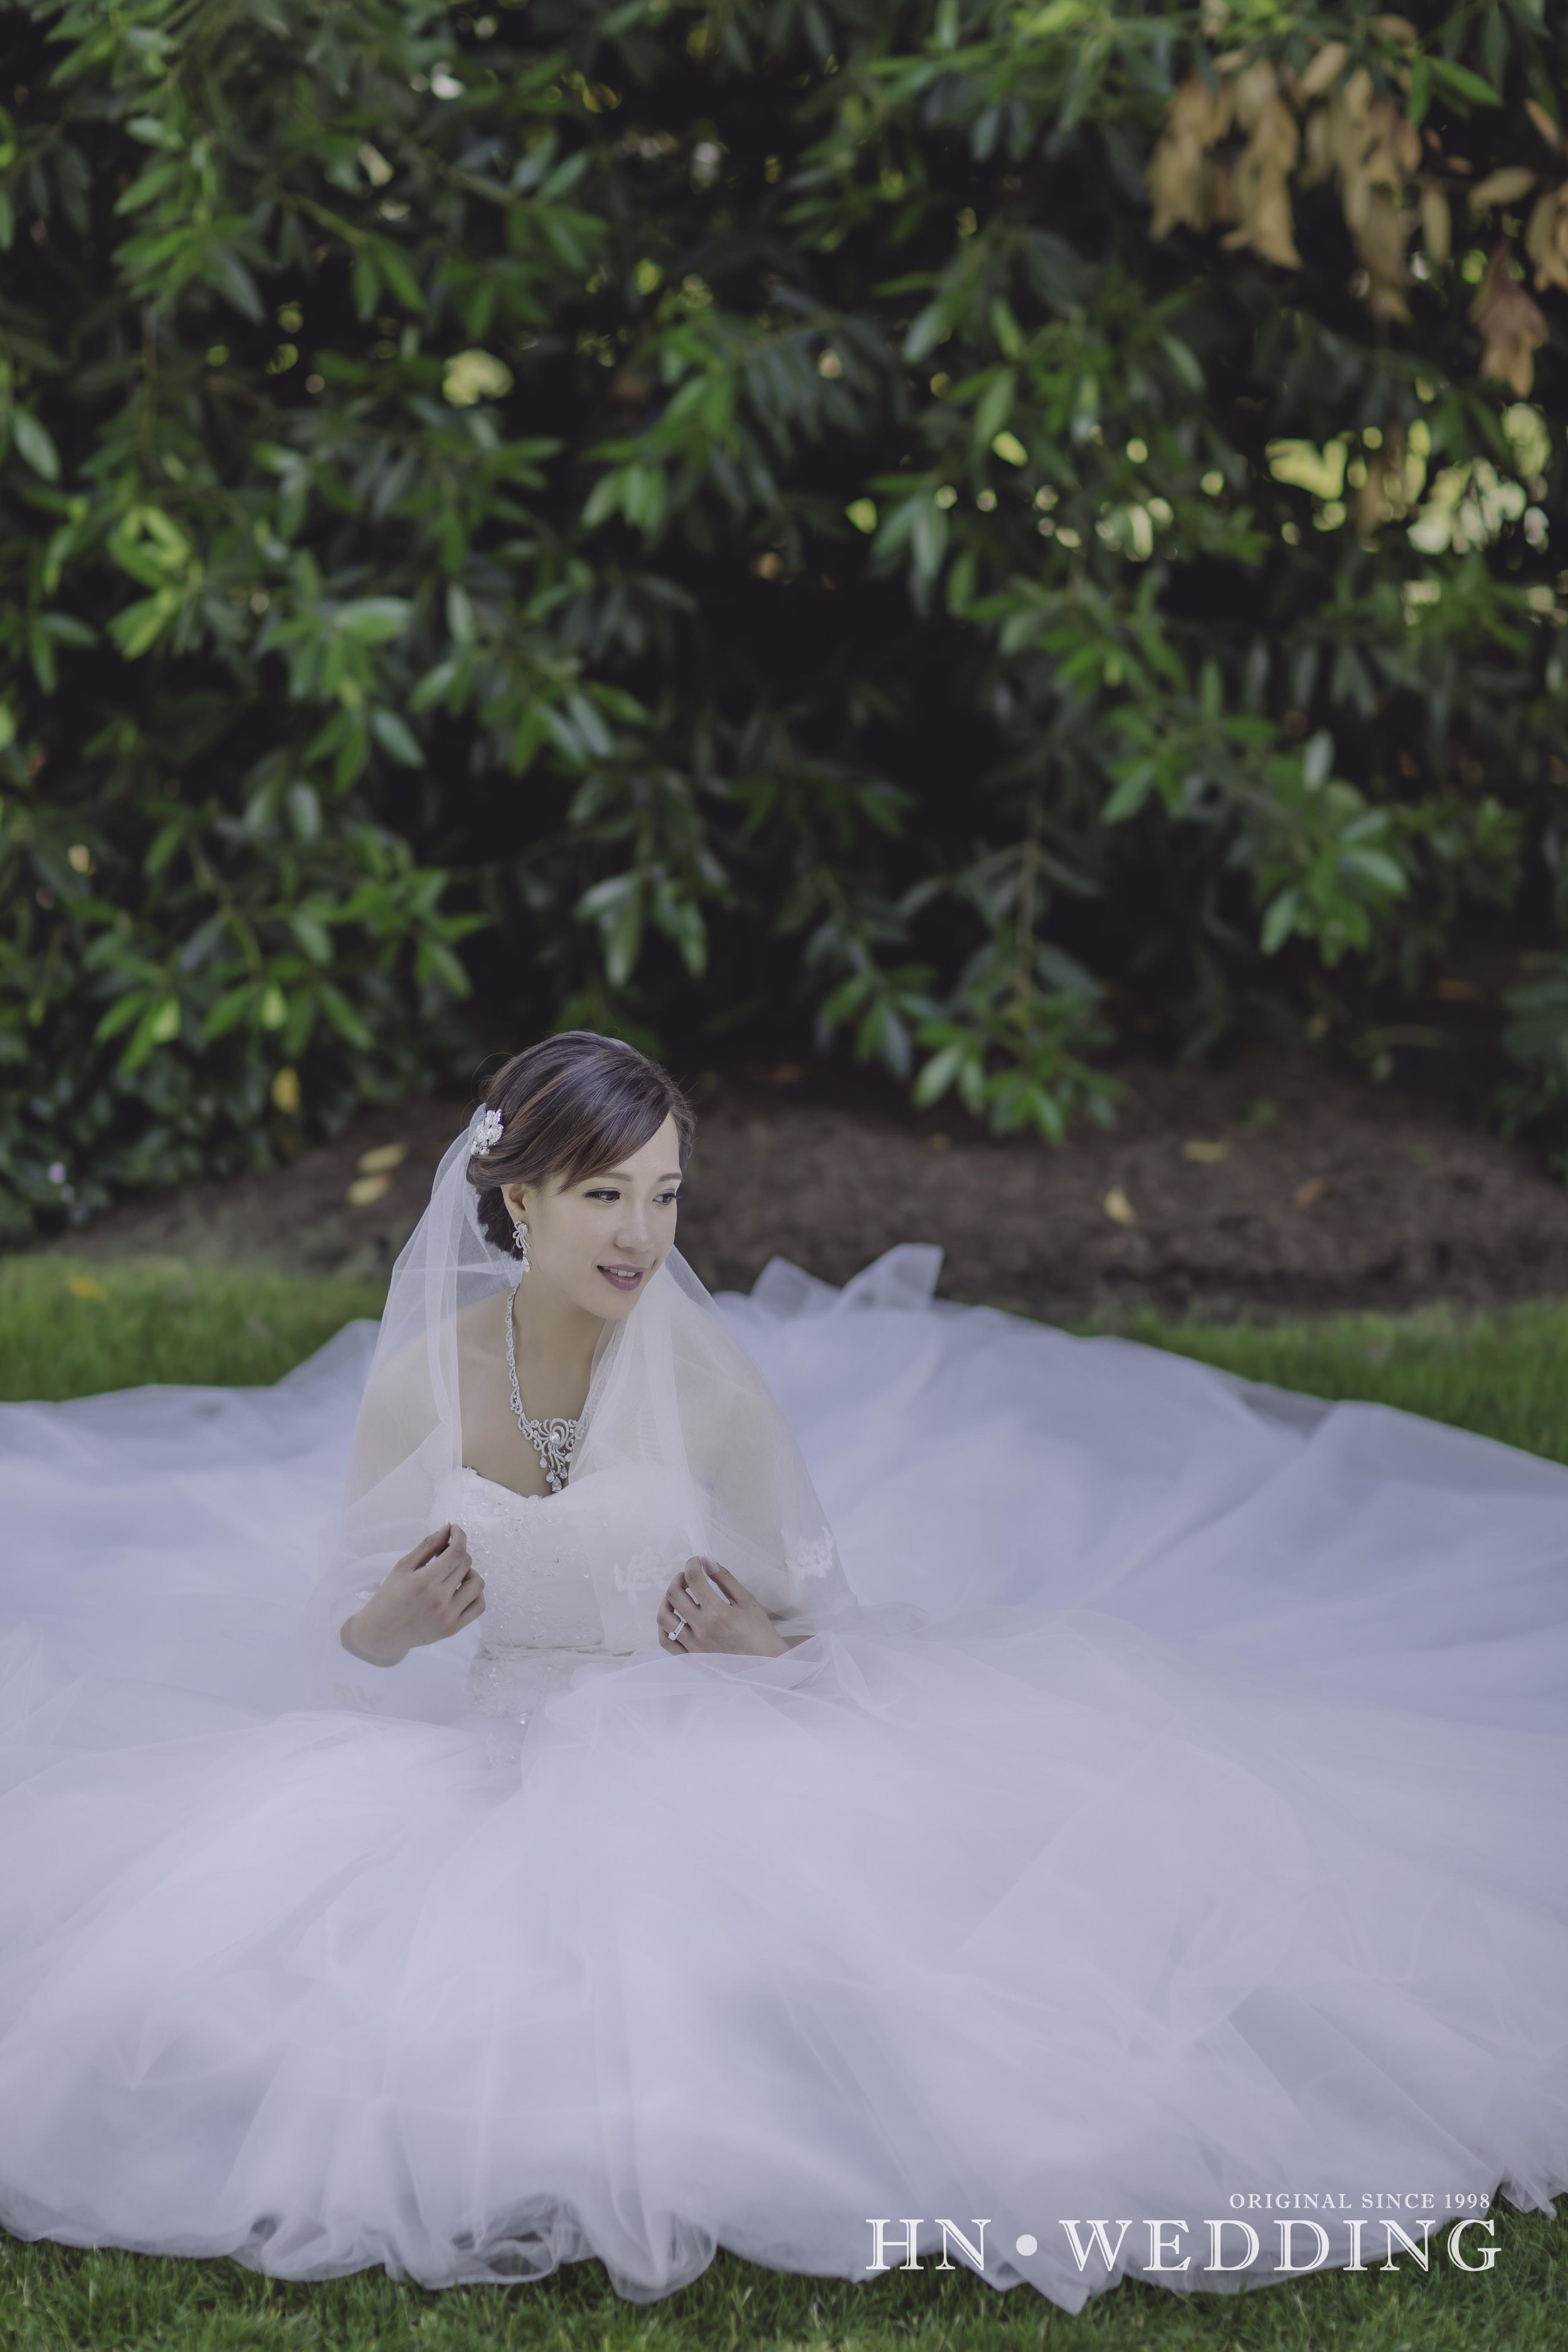 HNwedding-20160822-wedding-6366.jpg